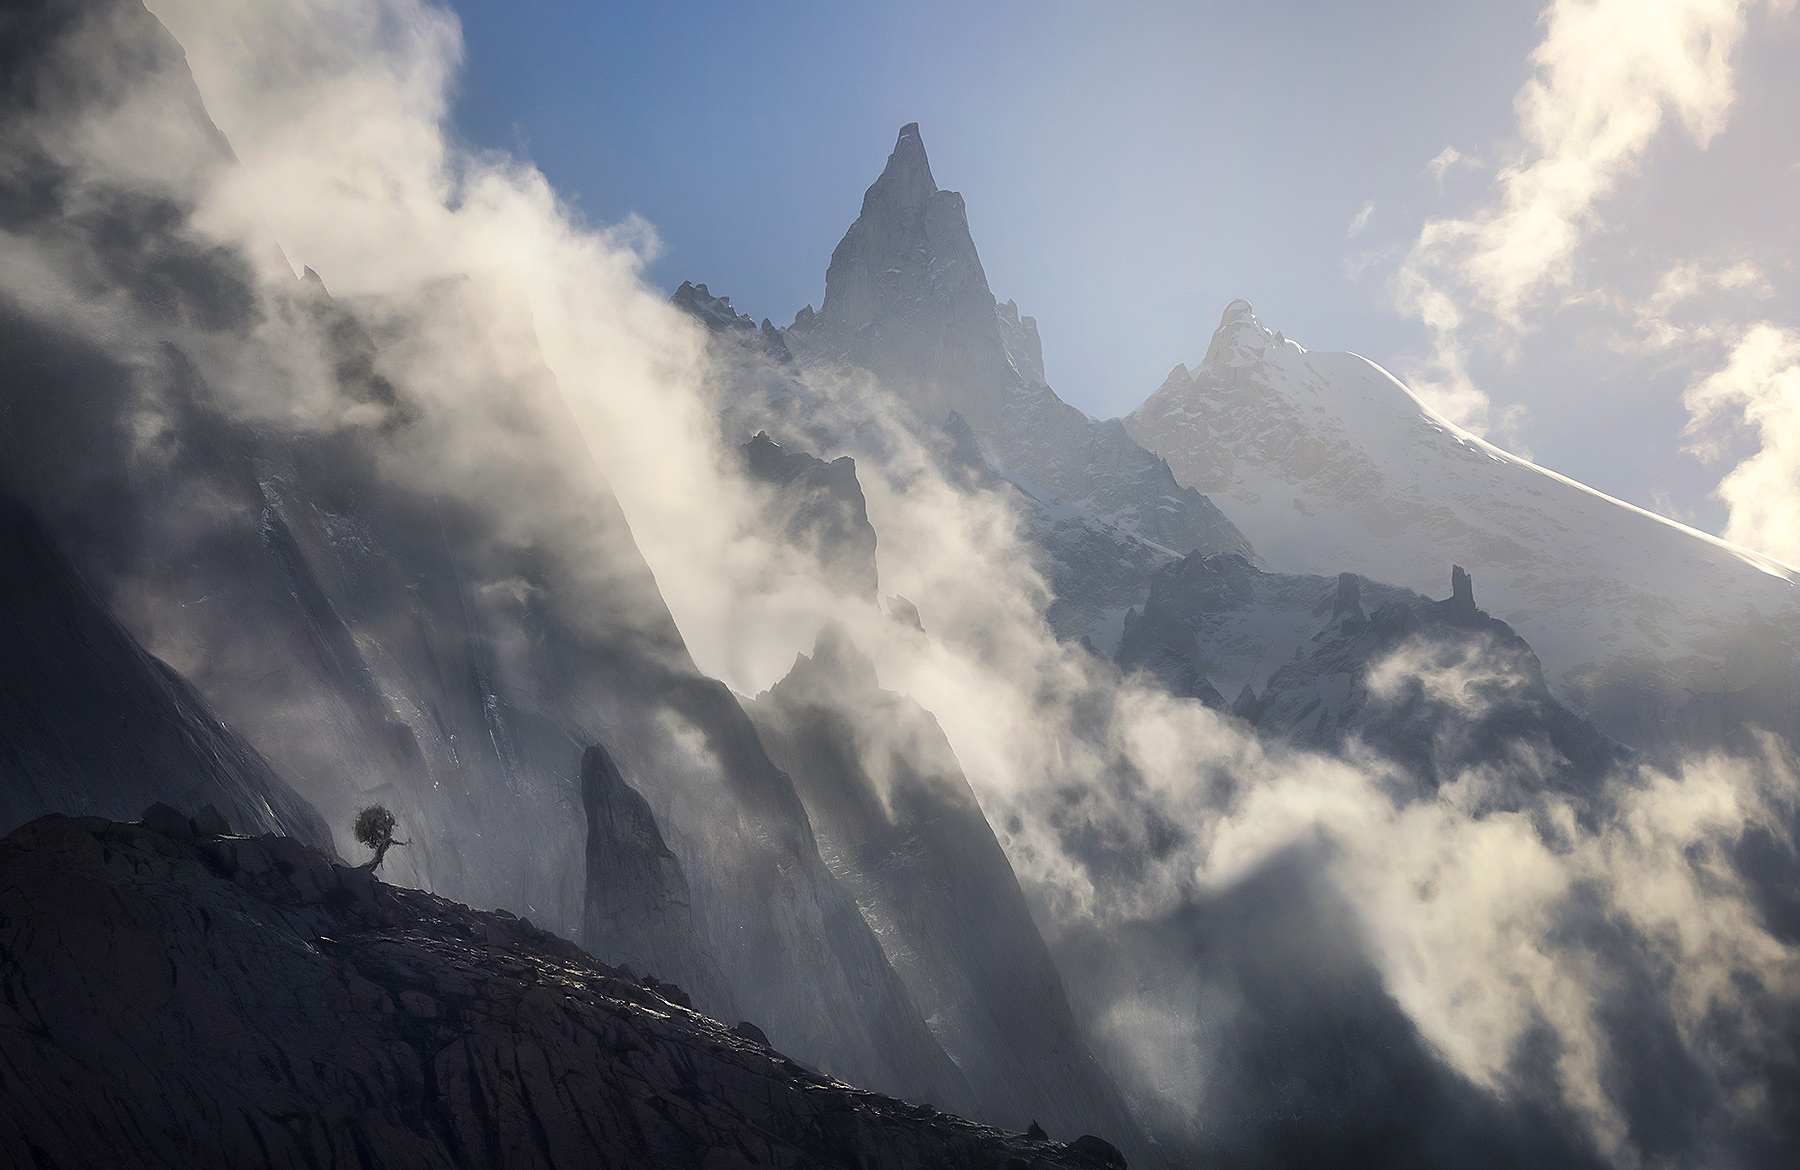 Layers of high peaks clear after an evening storm high in the Karakorum Himalayas of Pakistan.